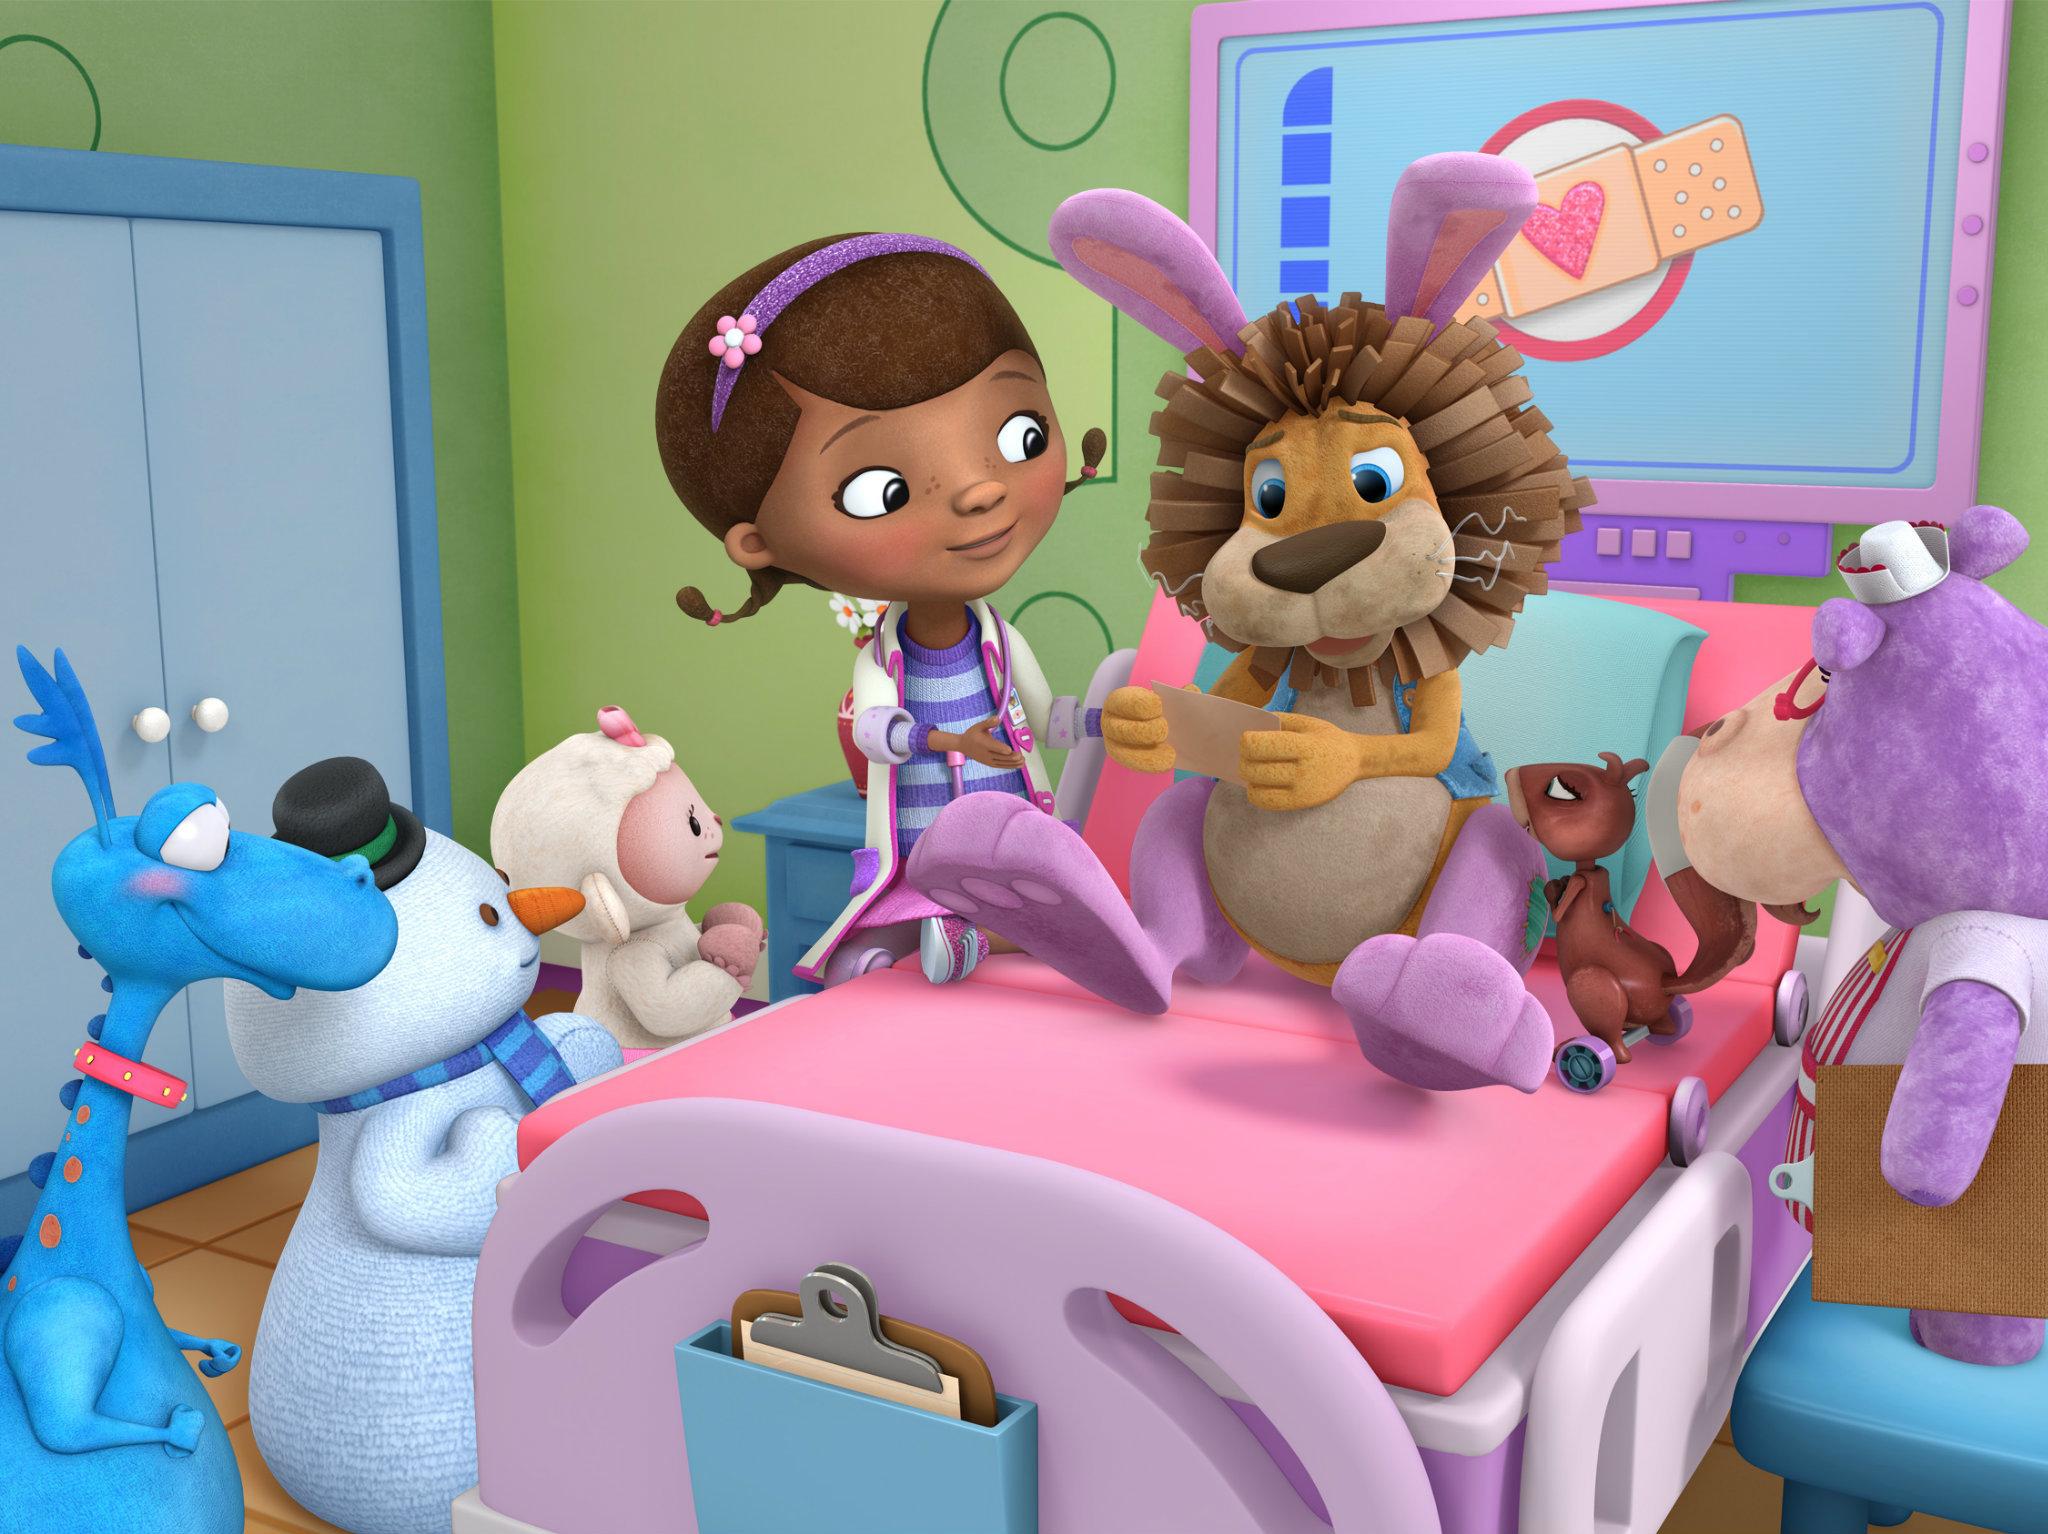 Doctora juguetes: cuarta temporada